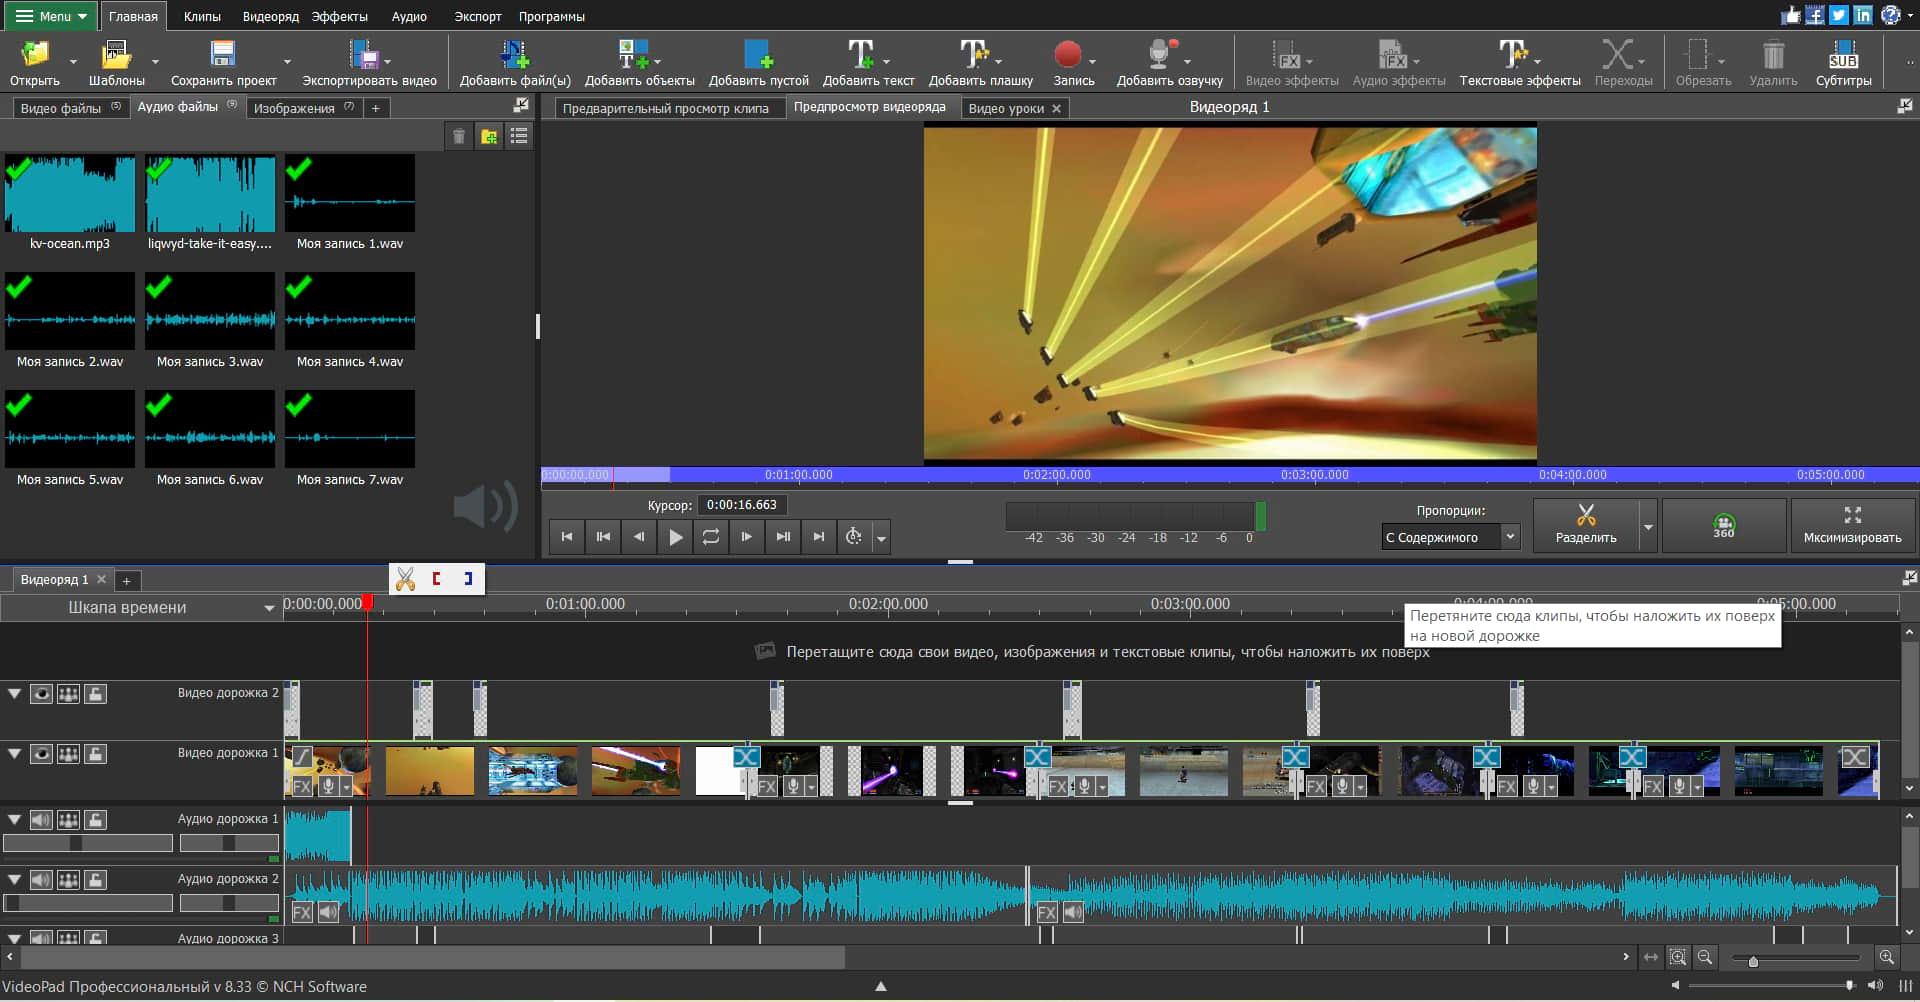 Интерфейс редактора VideoPad